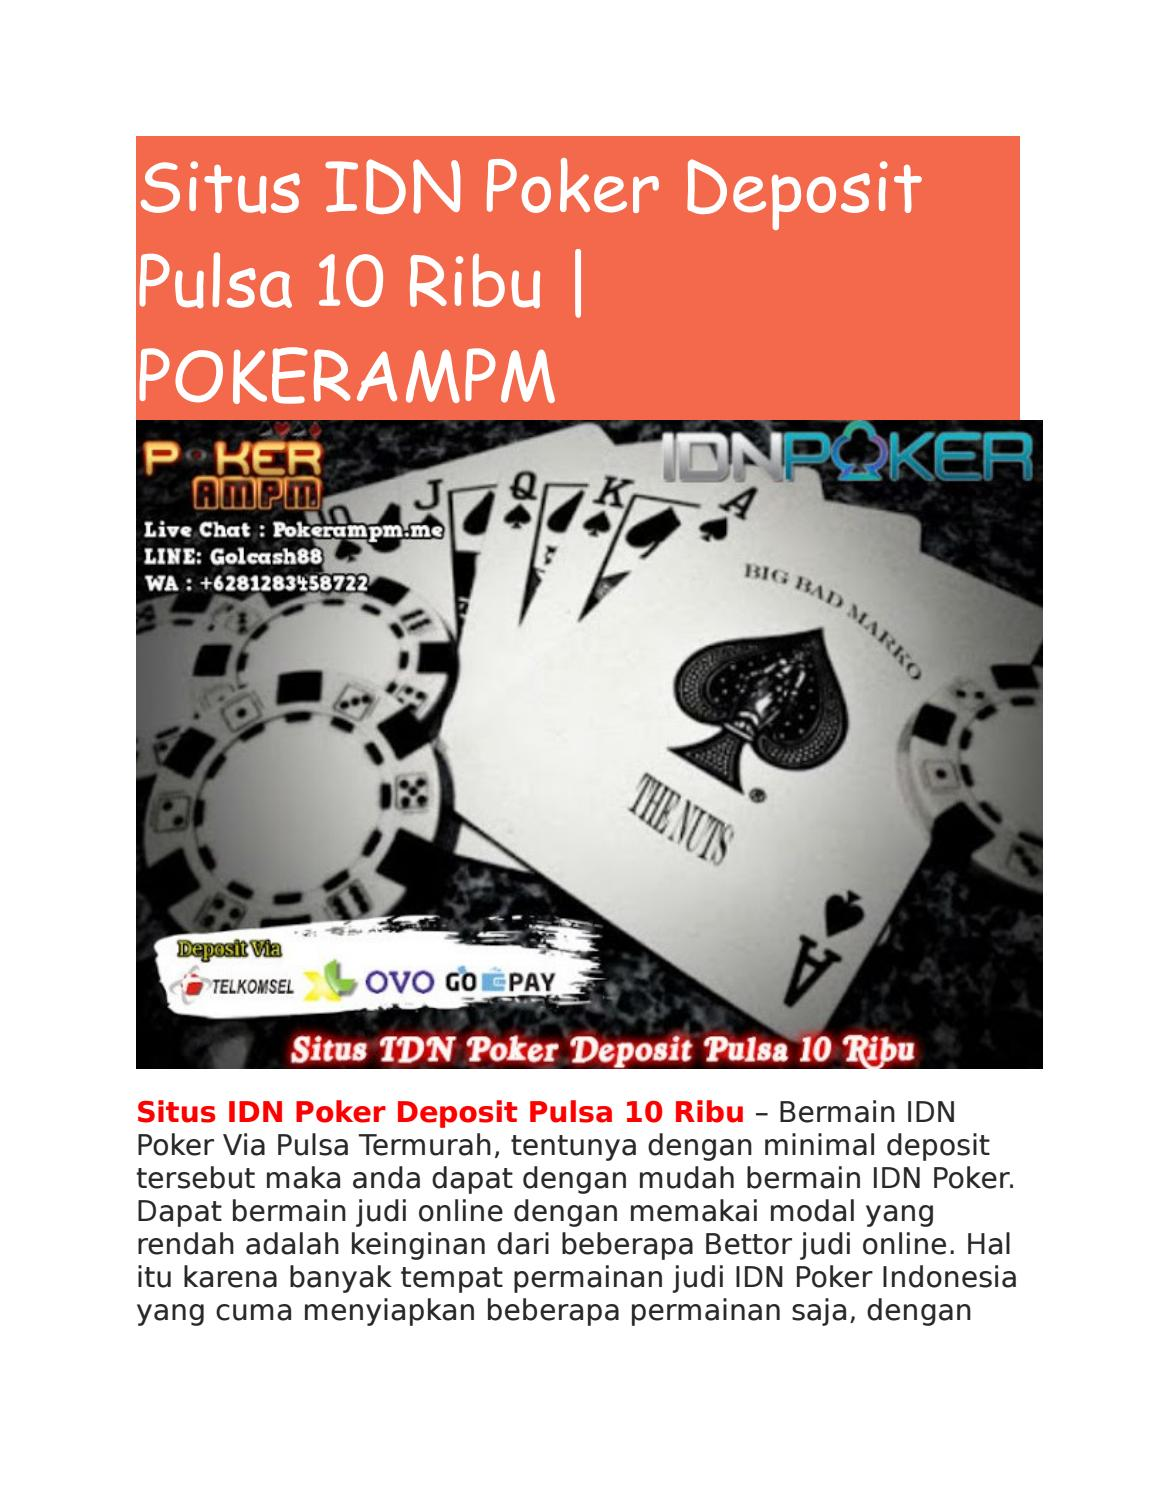 Situs Idn Poker Deposit Pulsa 10 Ribu Pokerampm By Pokerampmm Issuu